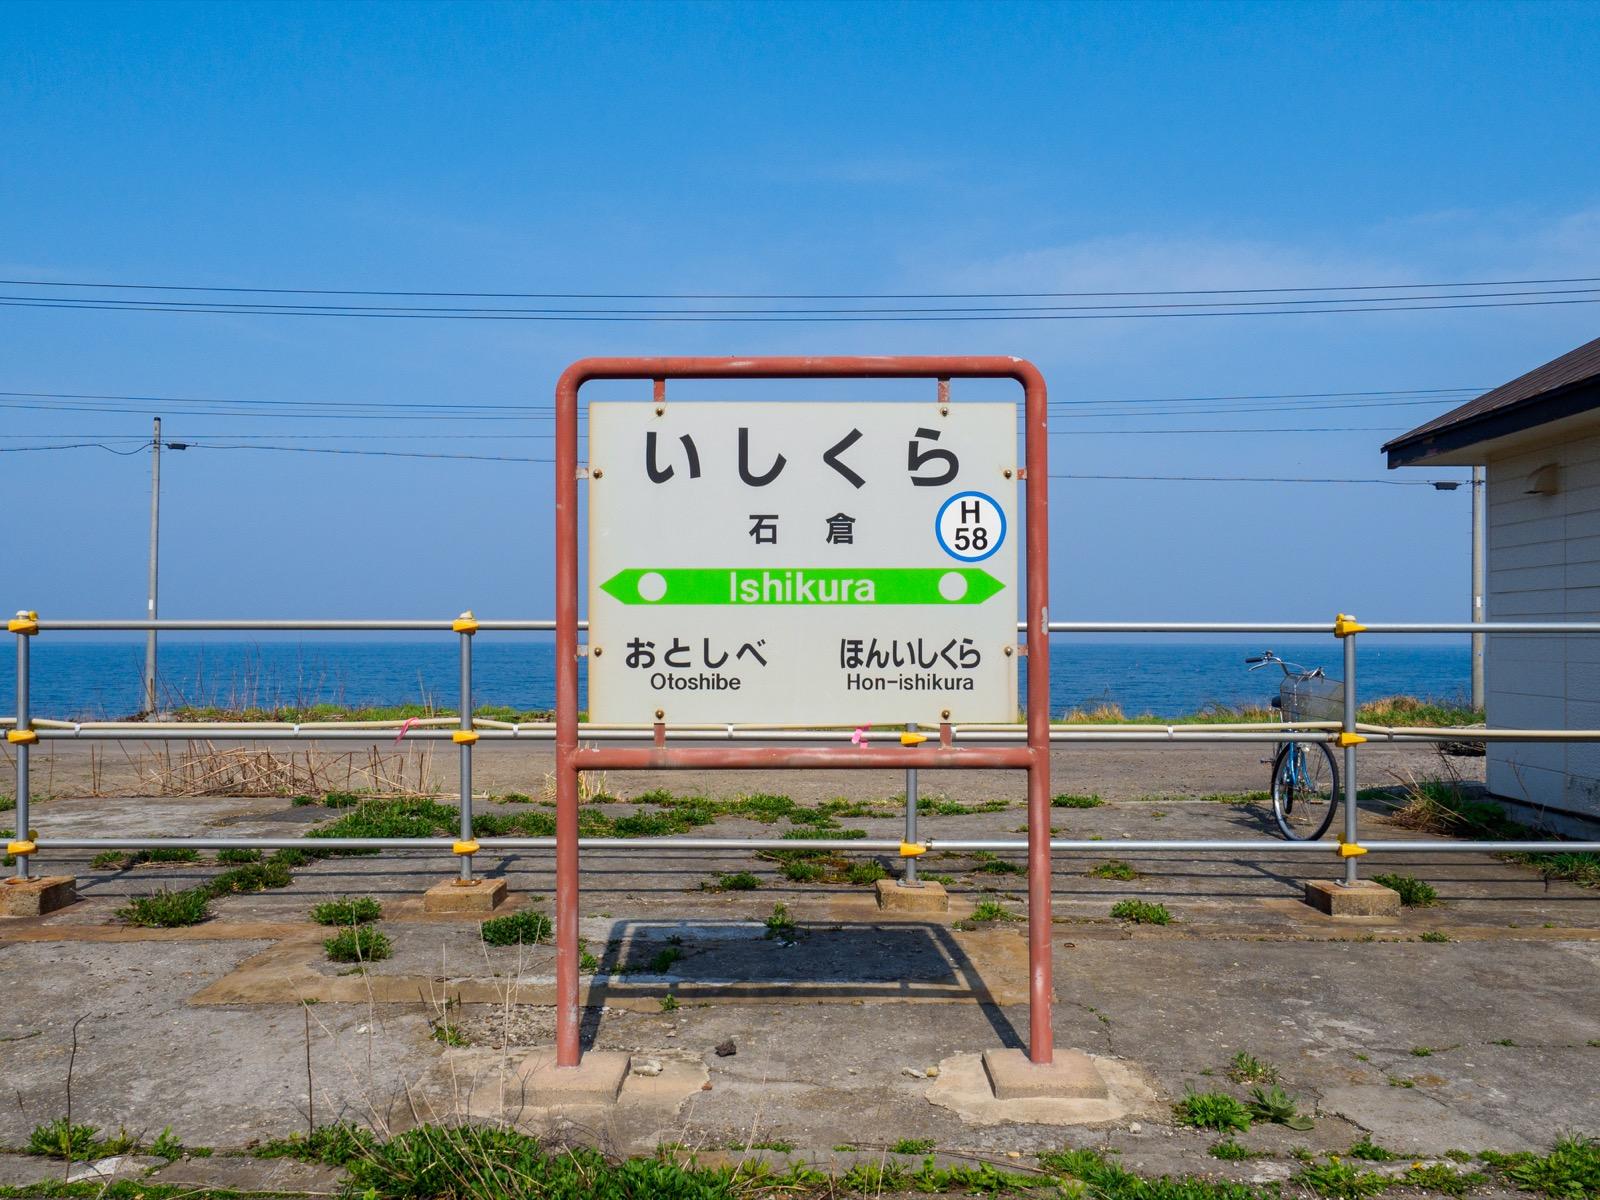 石倉駅の駅名標と噴火湾(内浦湾)